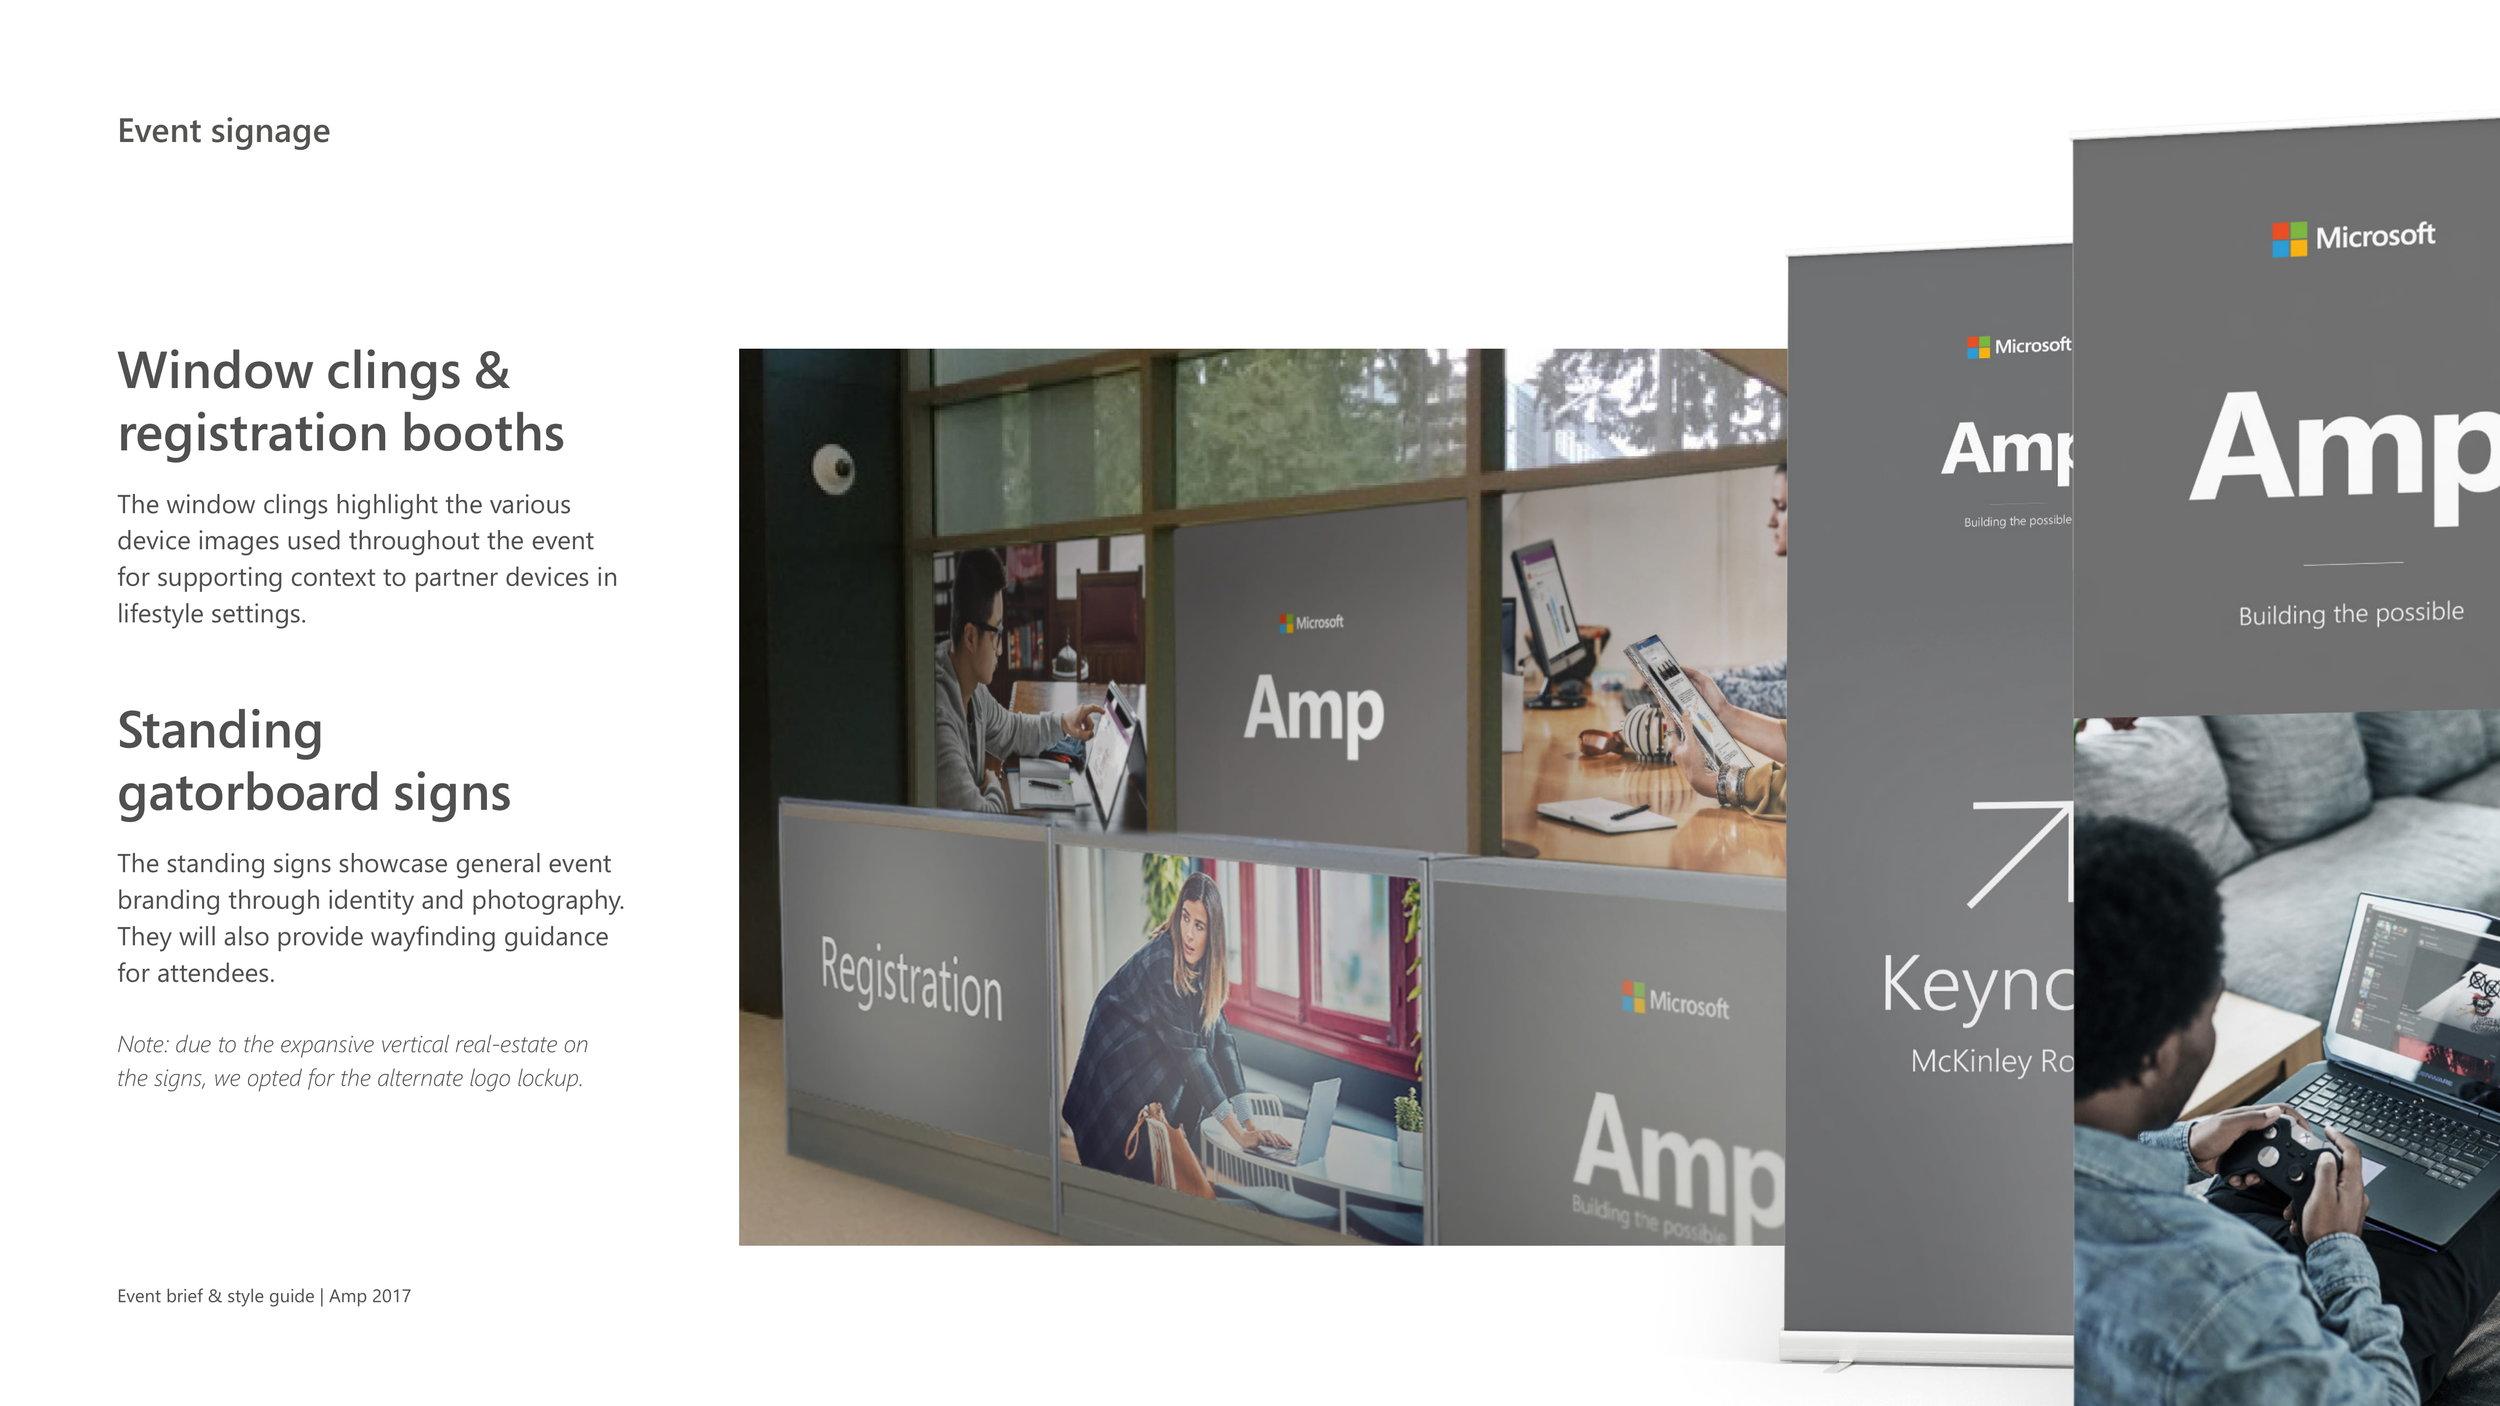 AMP_2017_Style_Guide_190629_1030-11.jpg